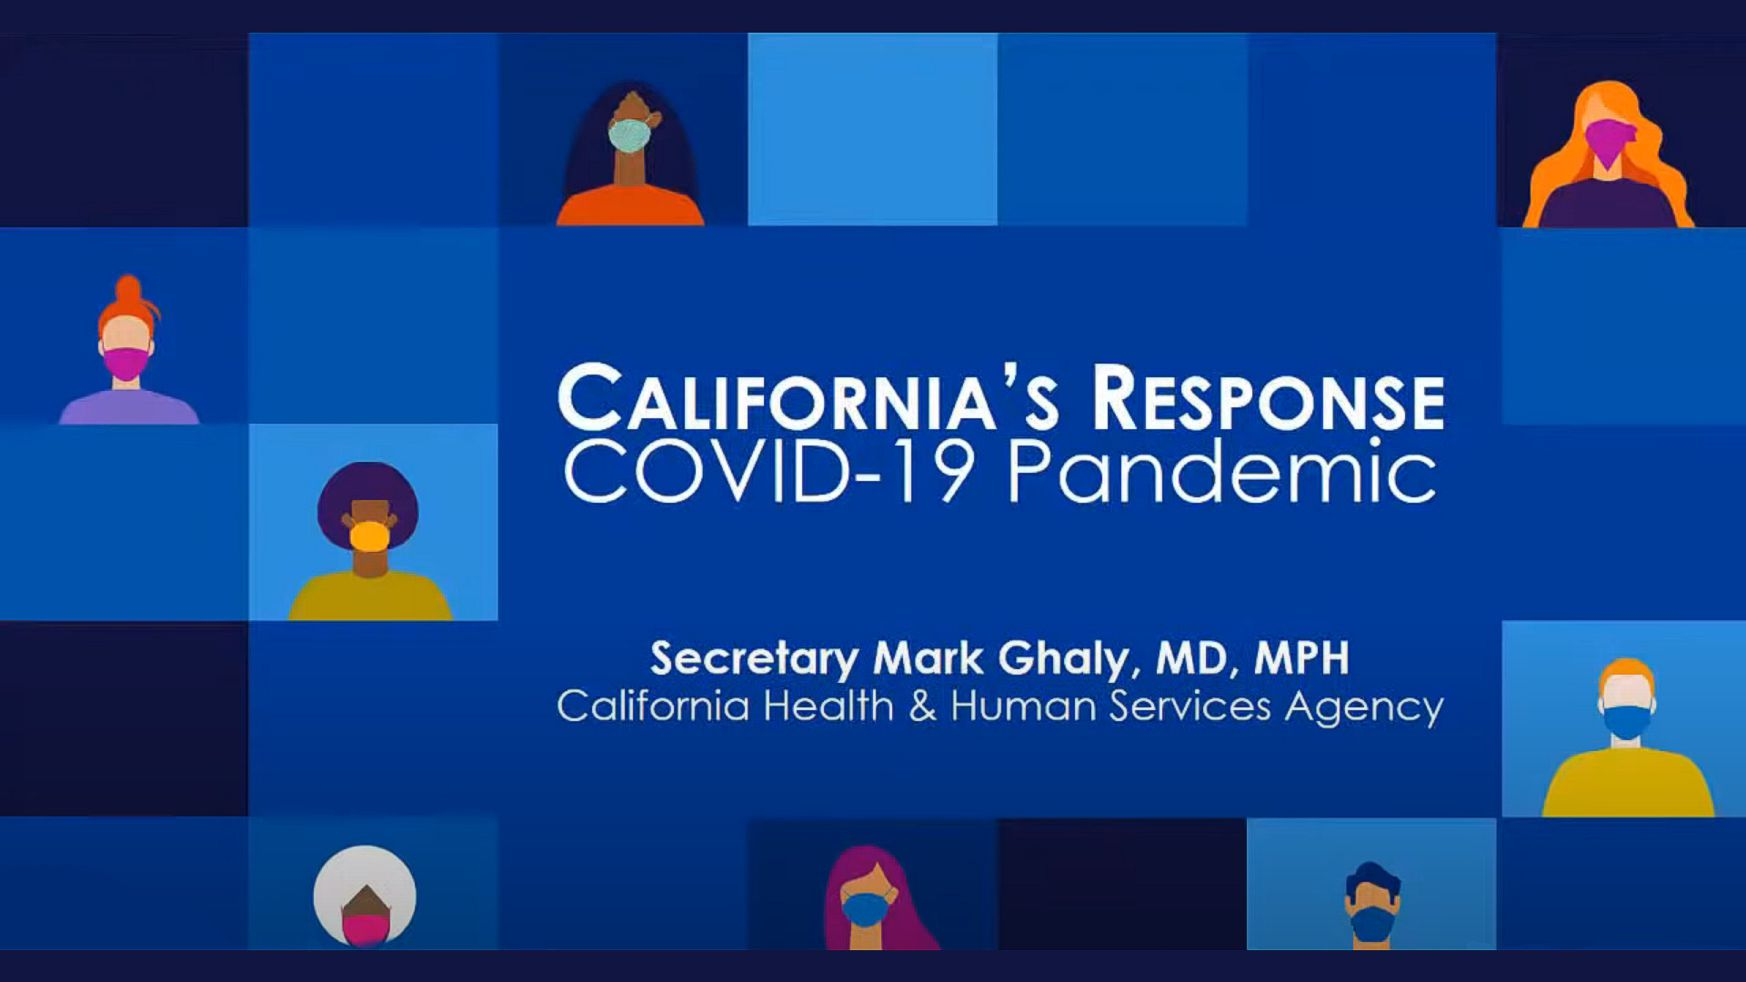 California's Response COVID-19 Pandemic